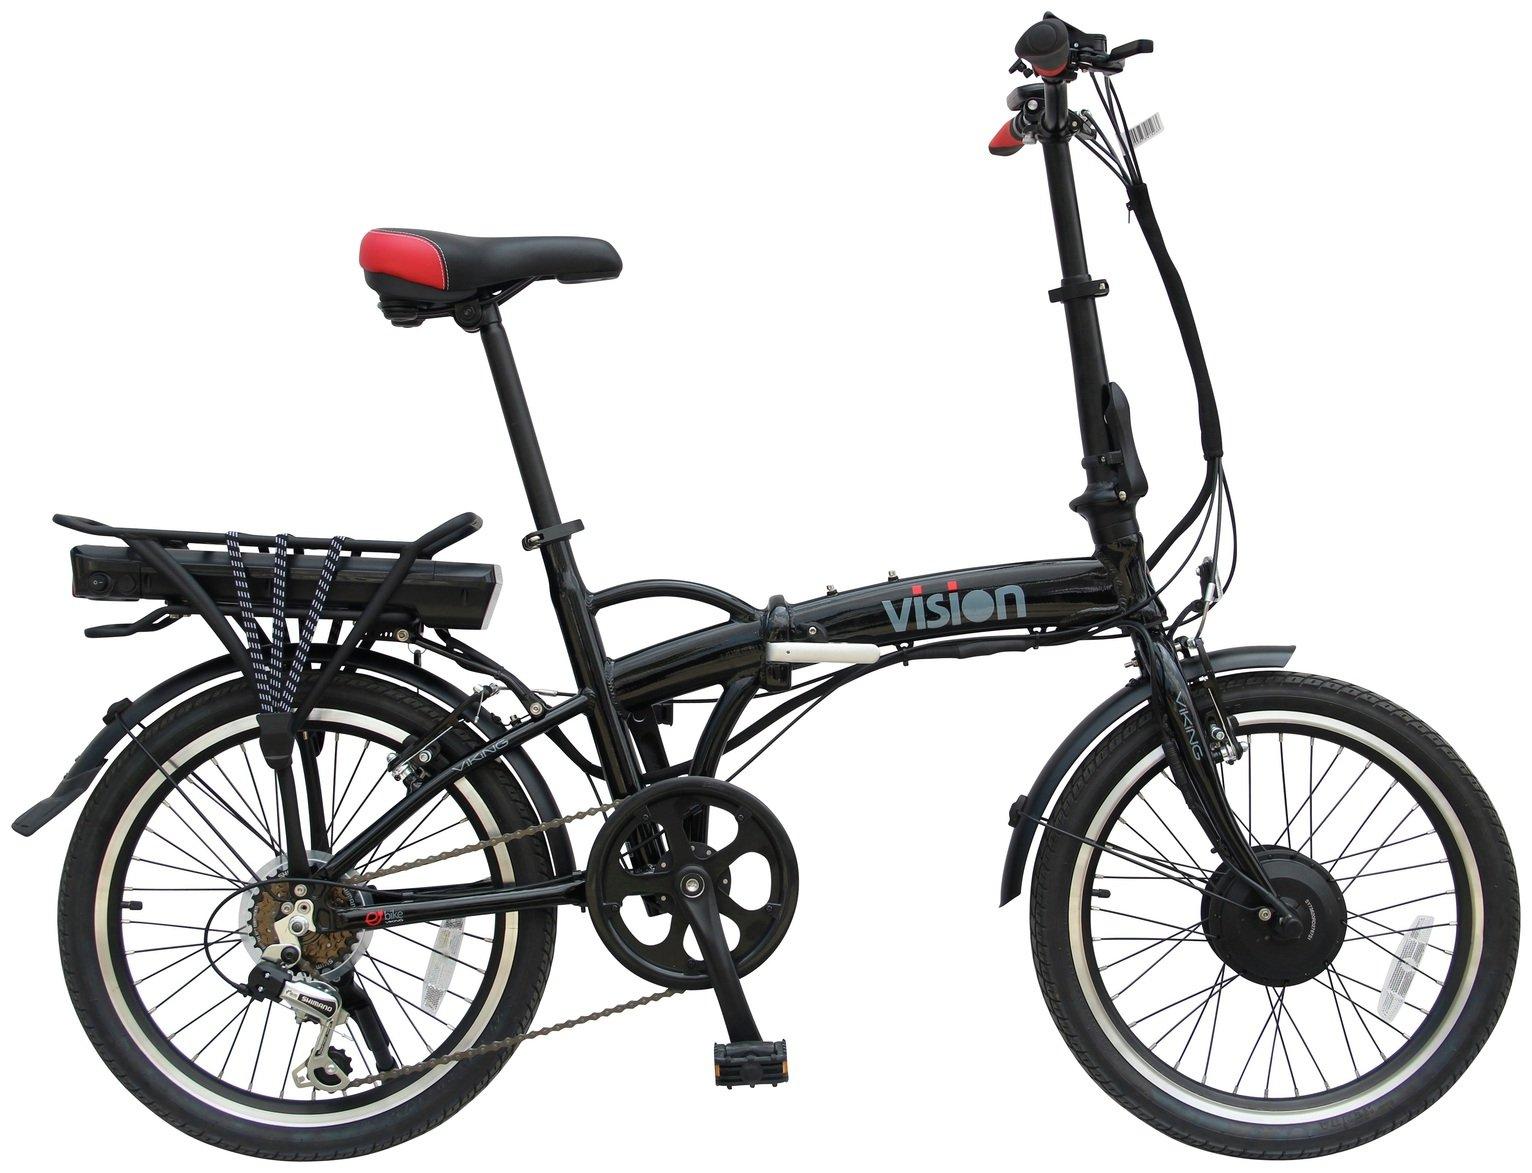 SALE on Viking Vision Folding Electric Bike - Black